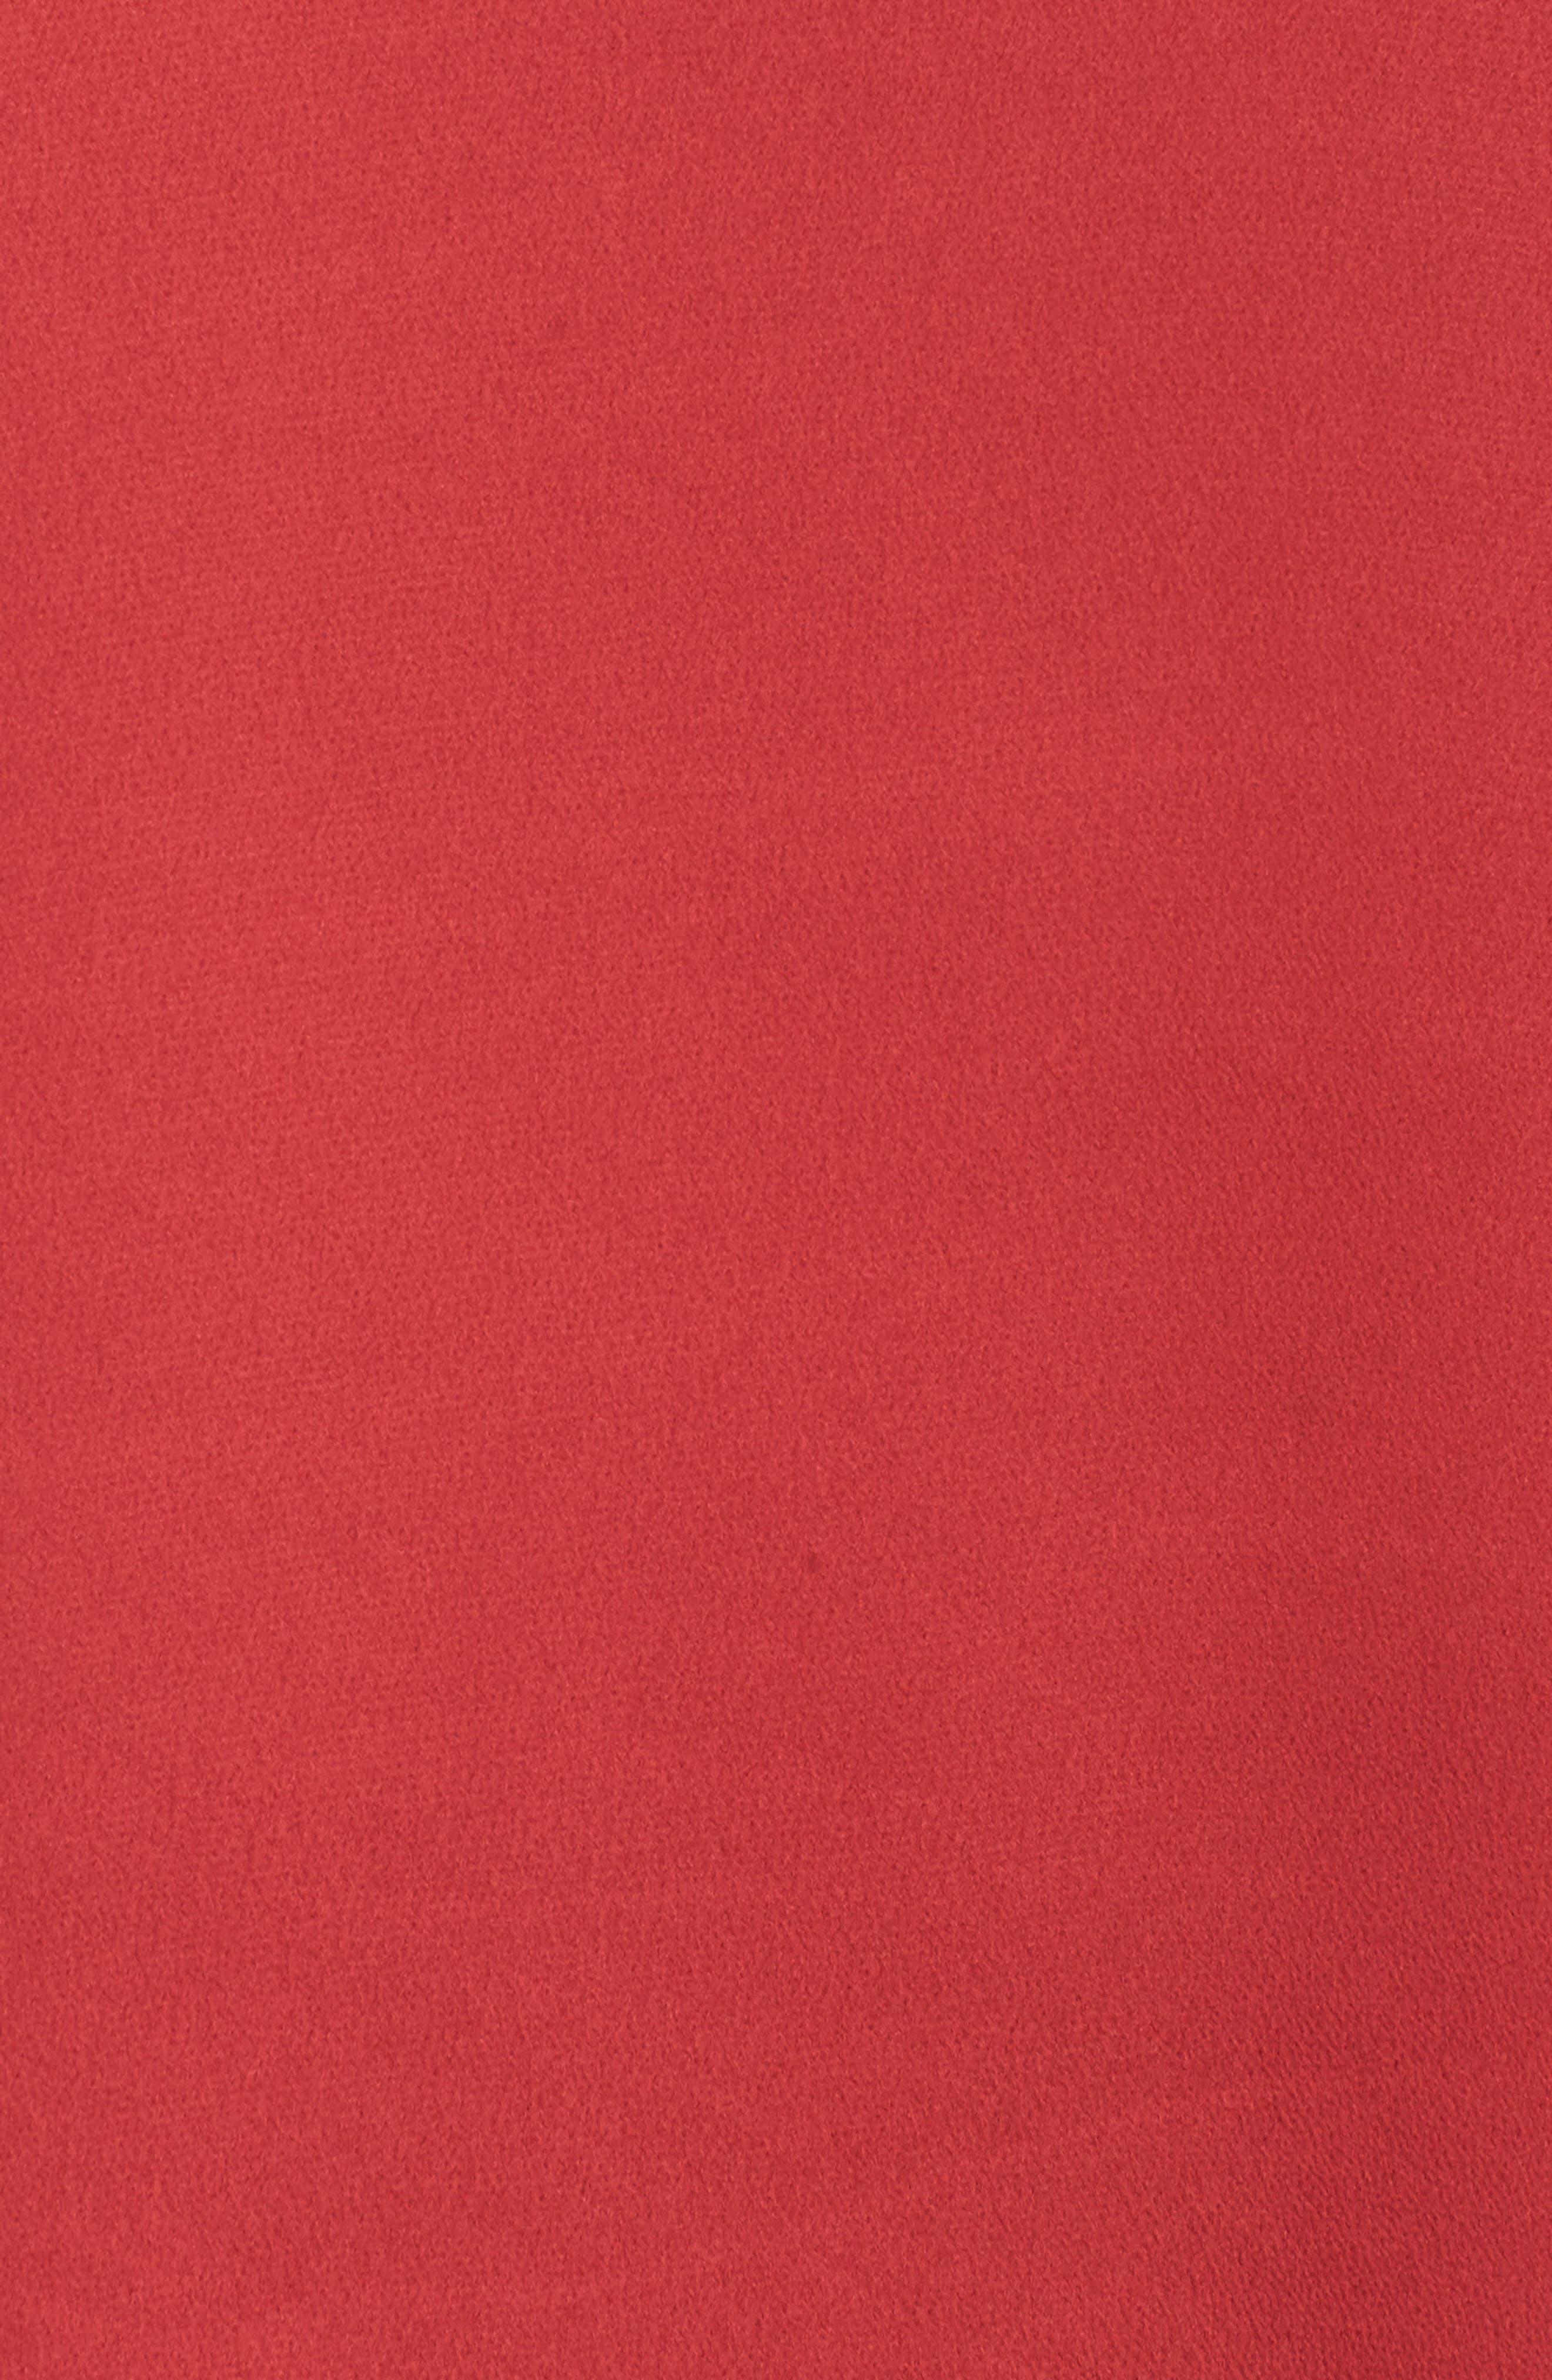 Ruffle Sleeve Blouse,                             Alternate thumbnail 5, color,                             CLARET